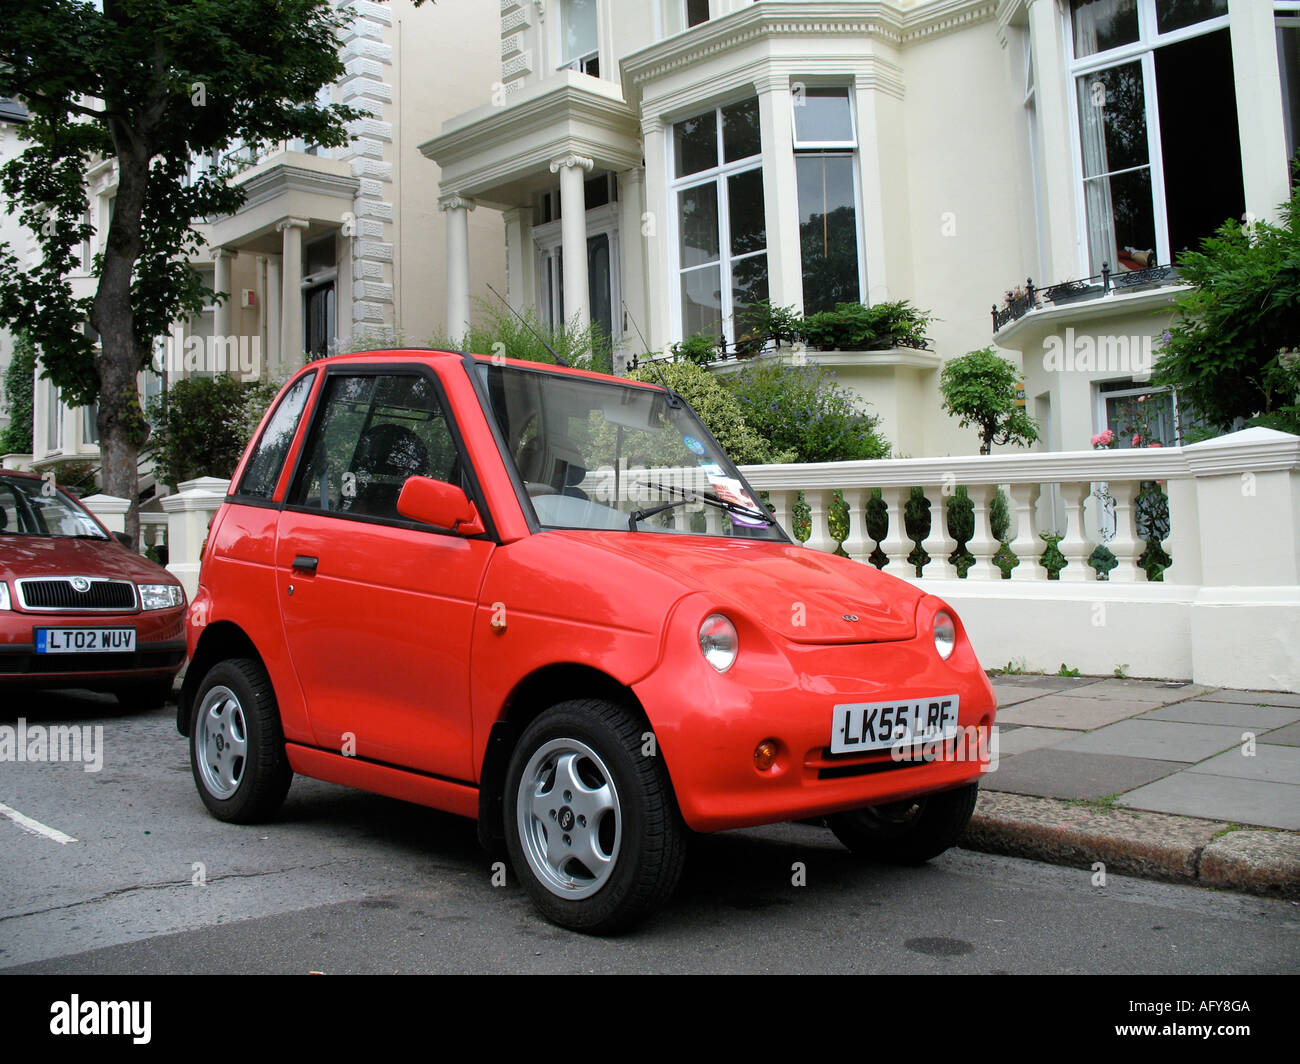 Reva G Wiz Electric Car On A London Street In The Uk Stock Photo